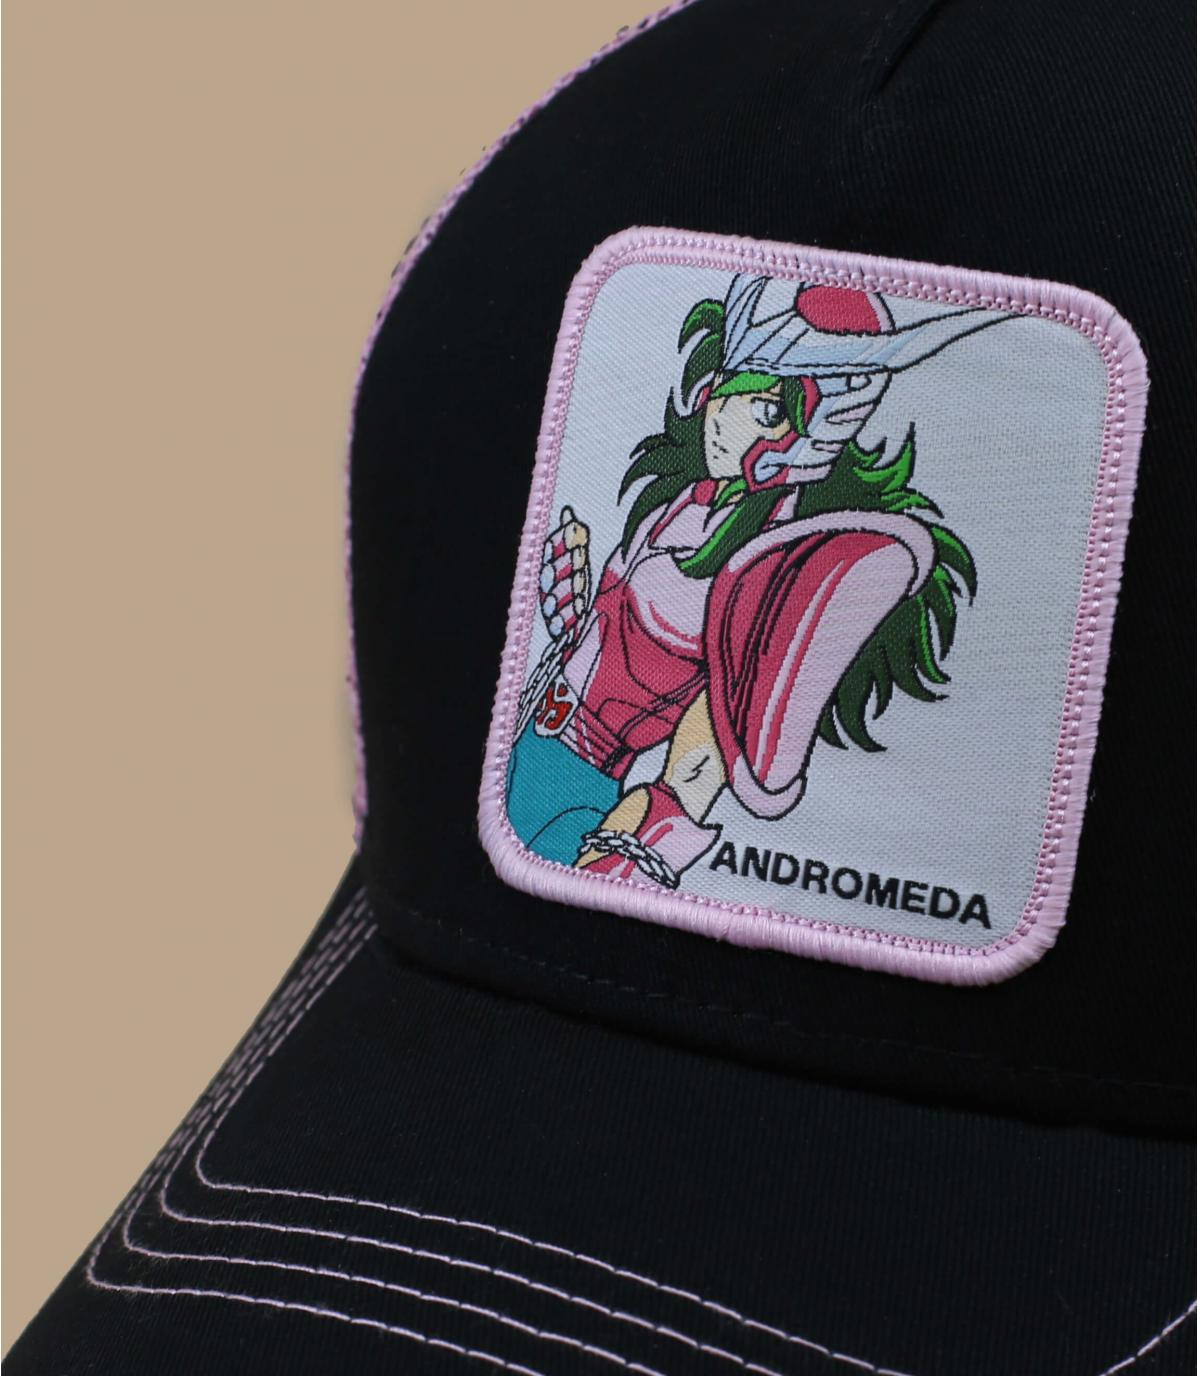 Detalles Trucker Andromeda imagen 2